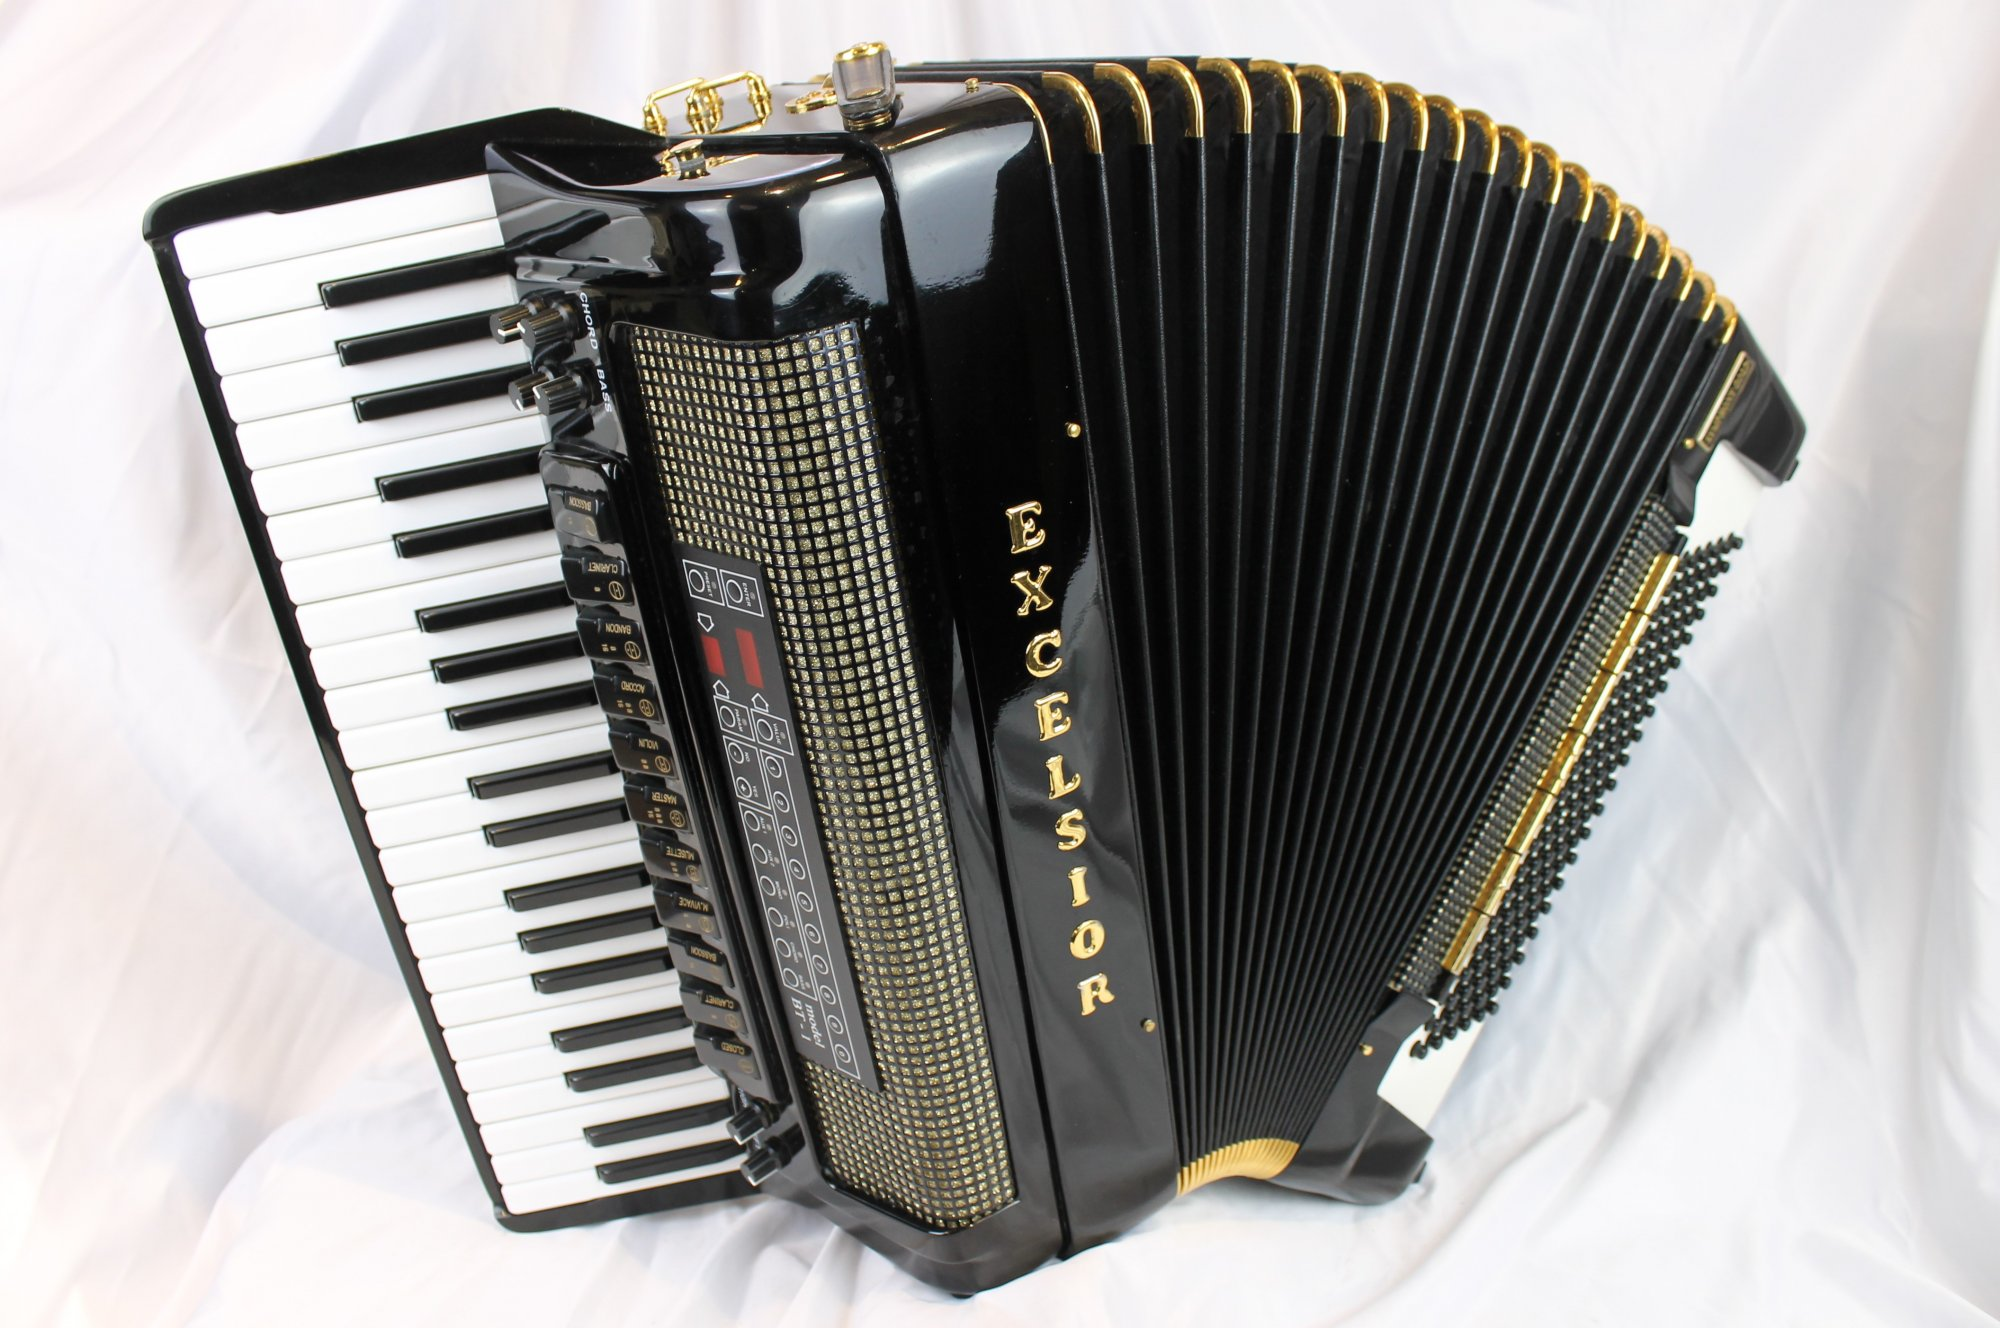 3895 - Black Excelsior Symphony Gold Piano Accordion LMMM 42 120